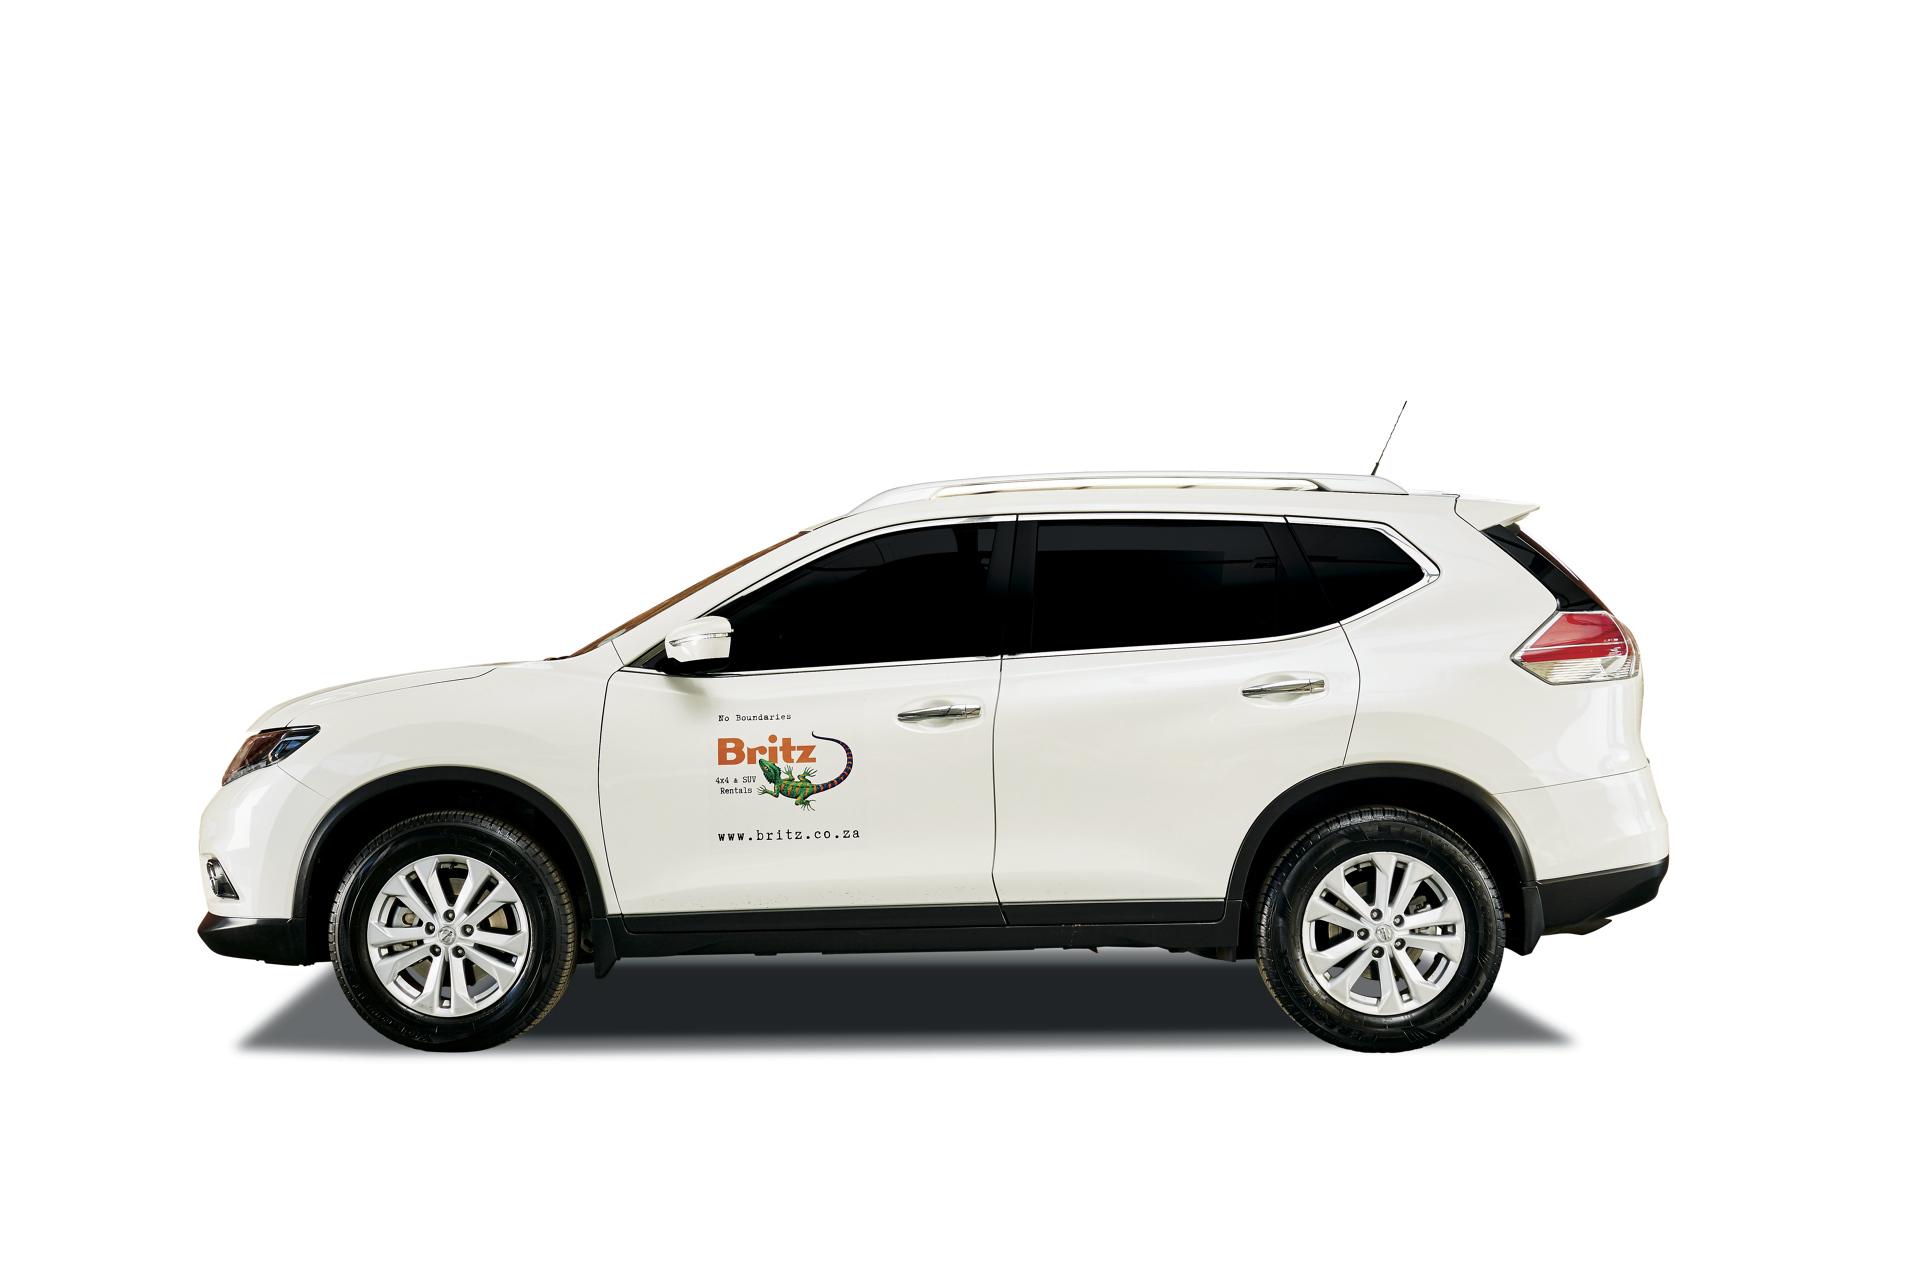 Gruppe BXTA: Nissan XTrail 4x4